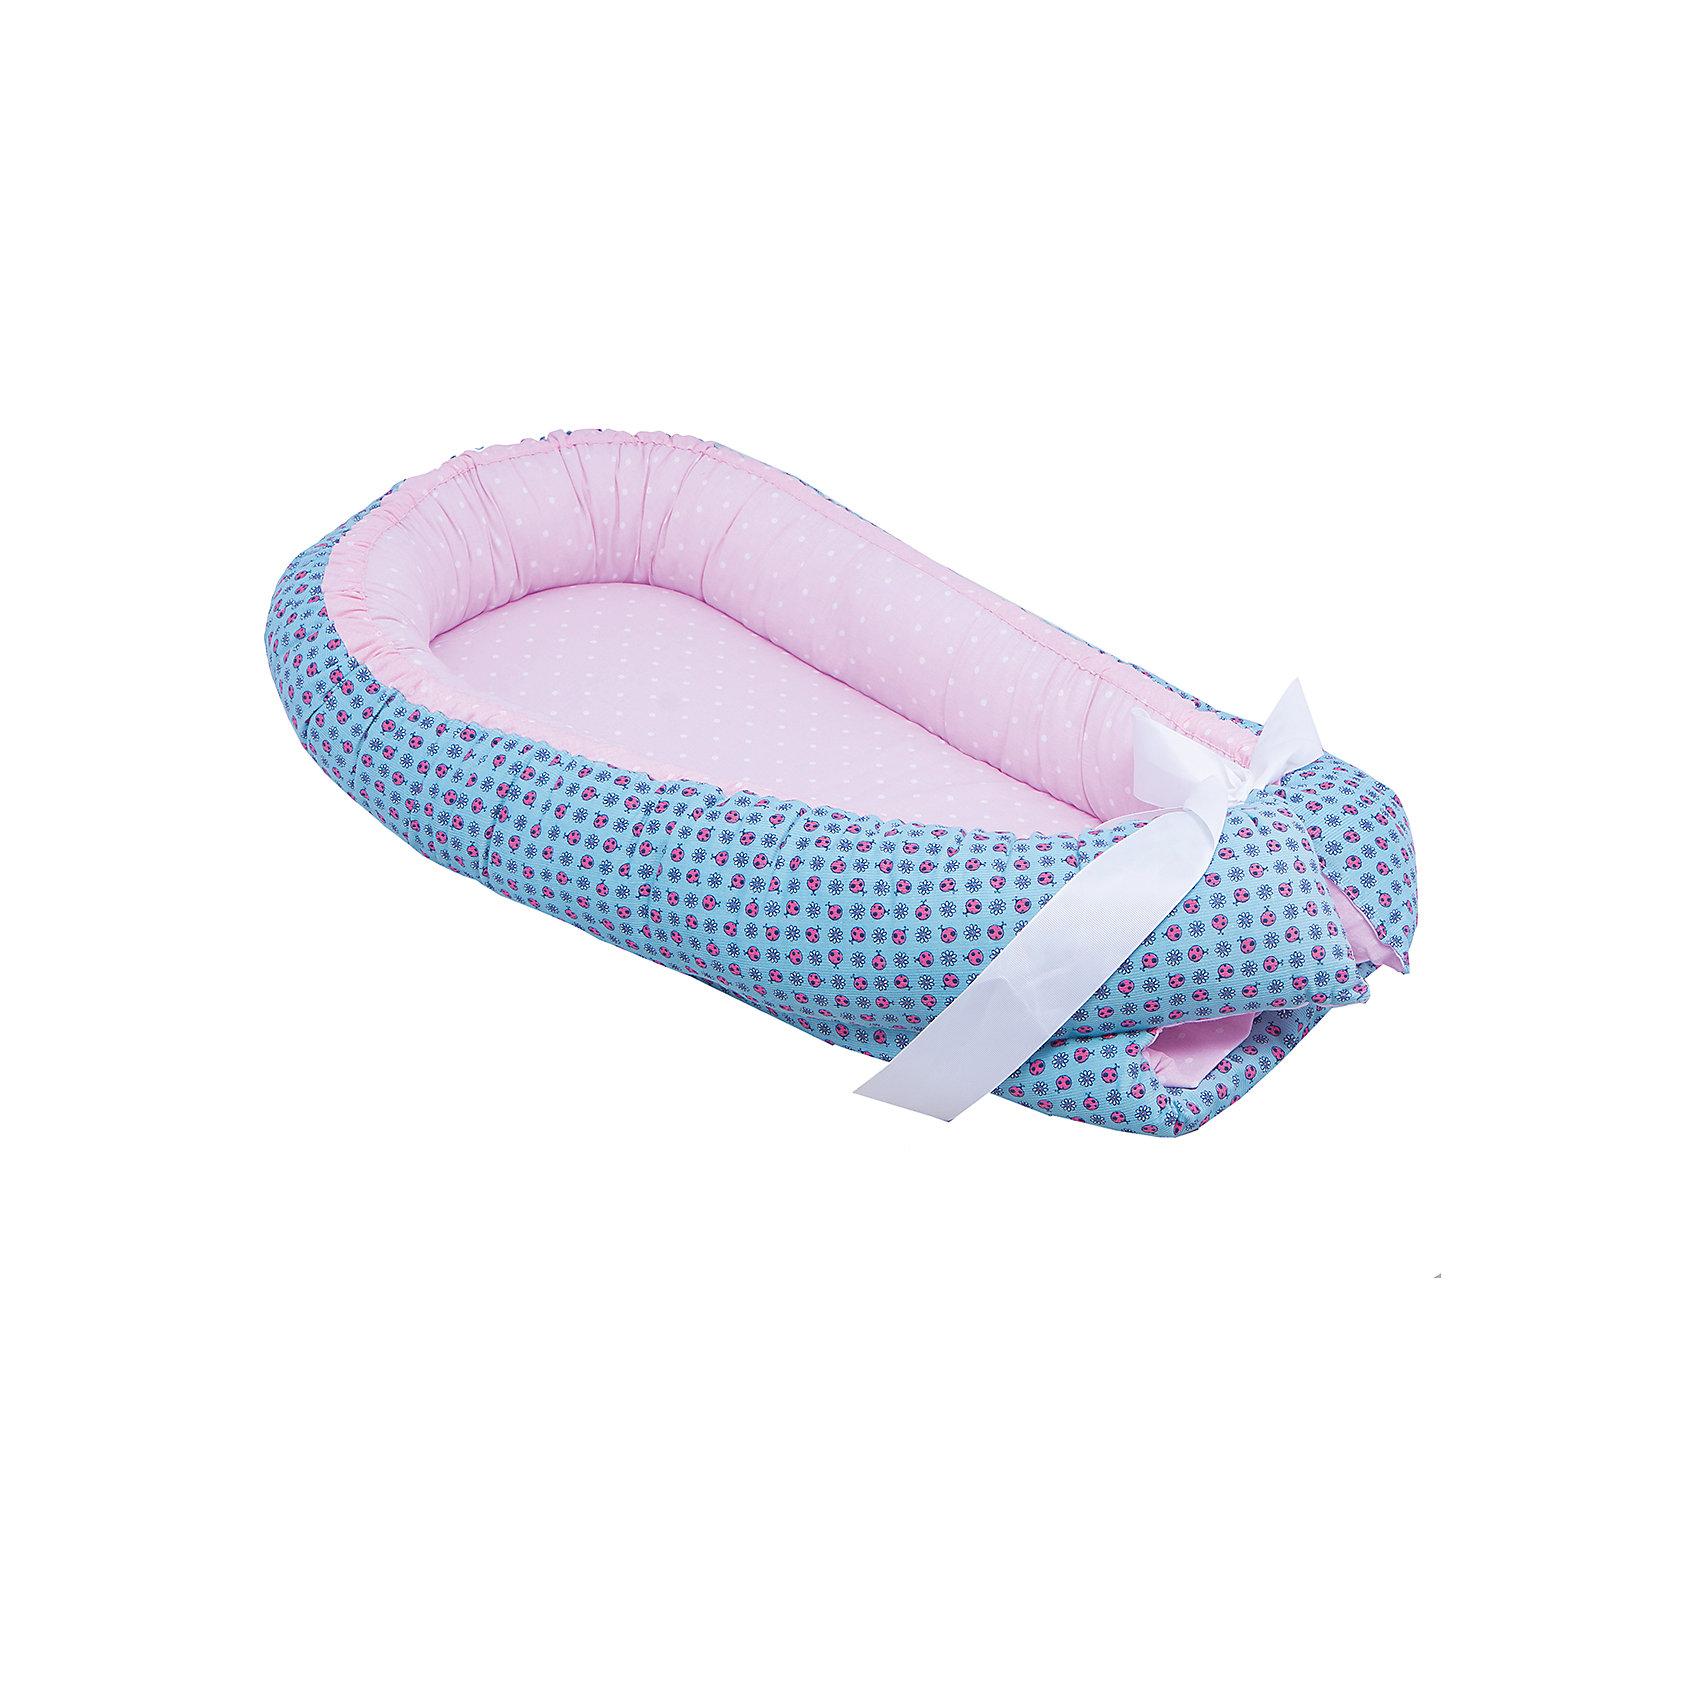 Baby Nice Бортик Гнездышко, Божья коровка, 85х45см, Baby Nice, голубой baby nice бортик мишки бязь baby nice розовый